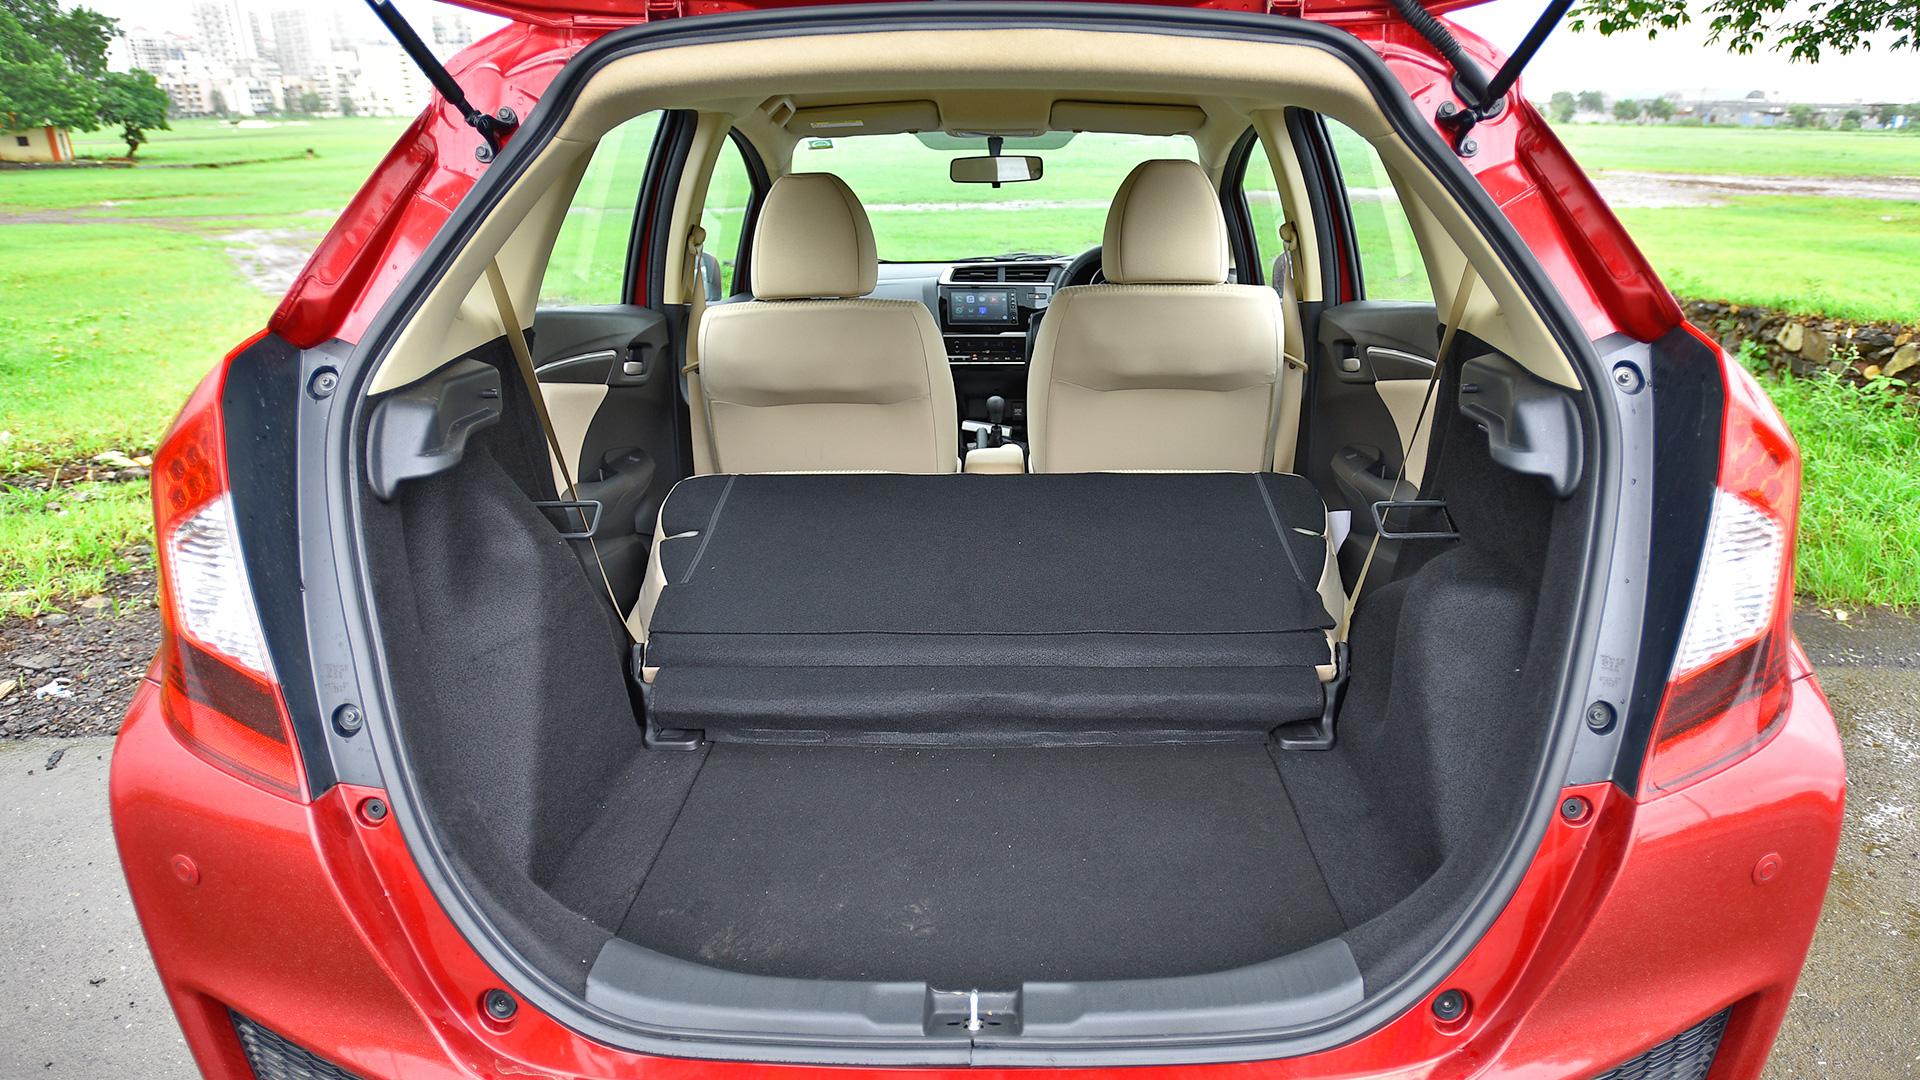 honda jazz 2018 petrol vx interior car photos overdrive. Black Bedroom Furniture Sets. Home Design Ideas